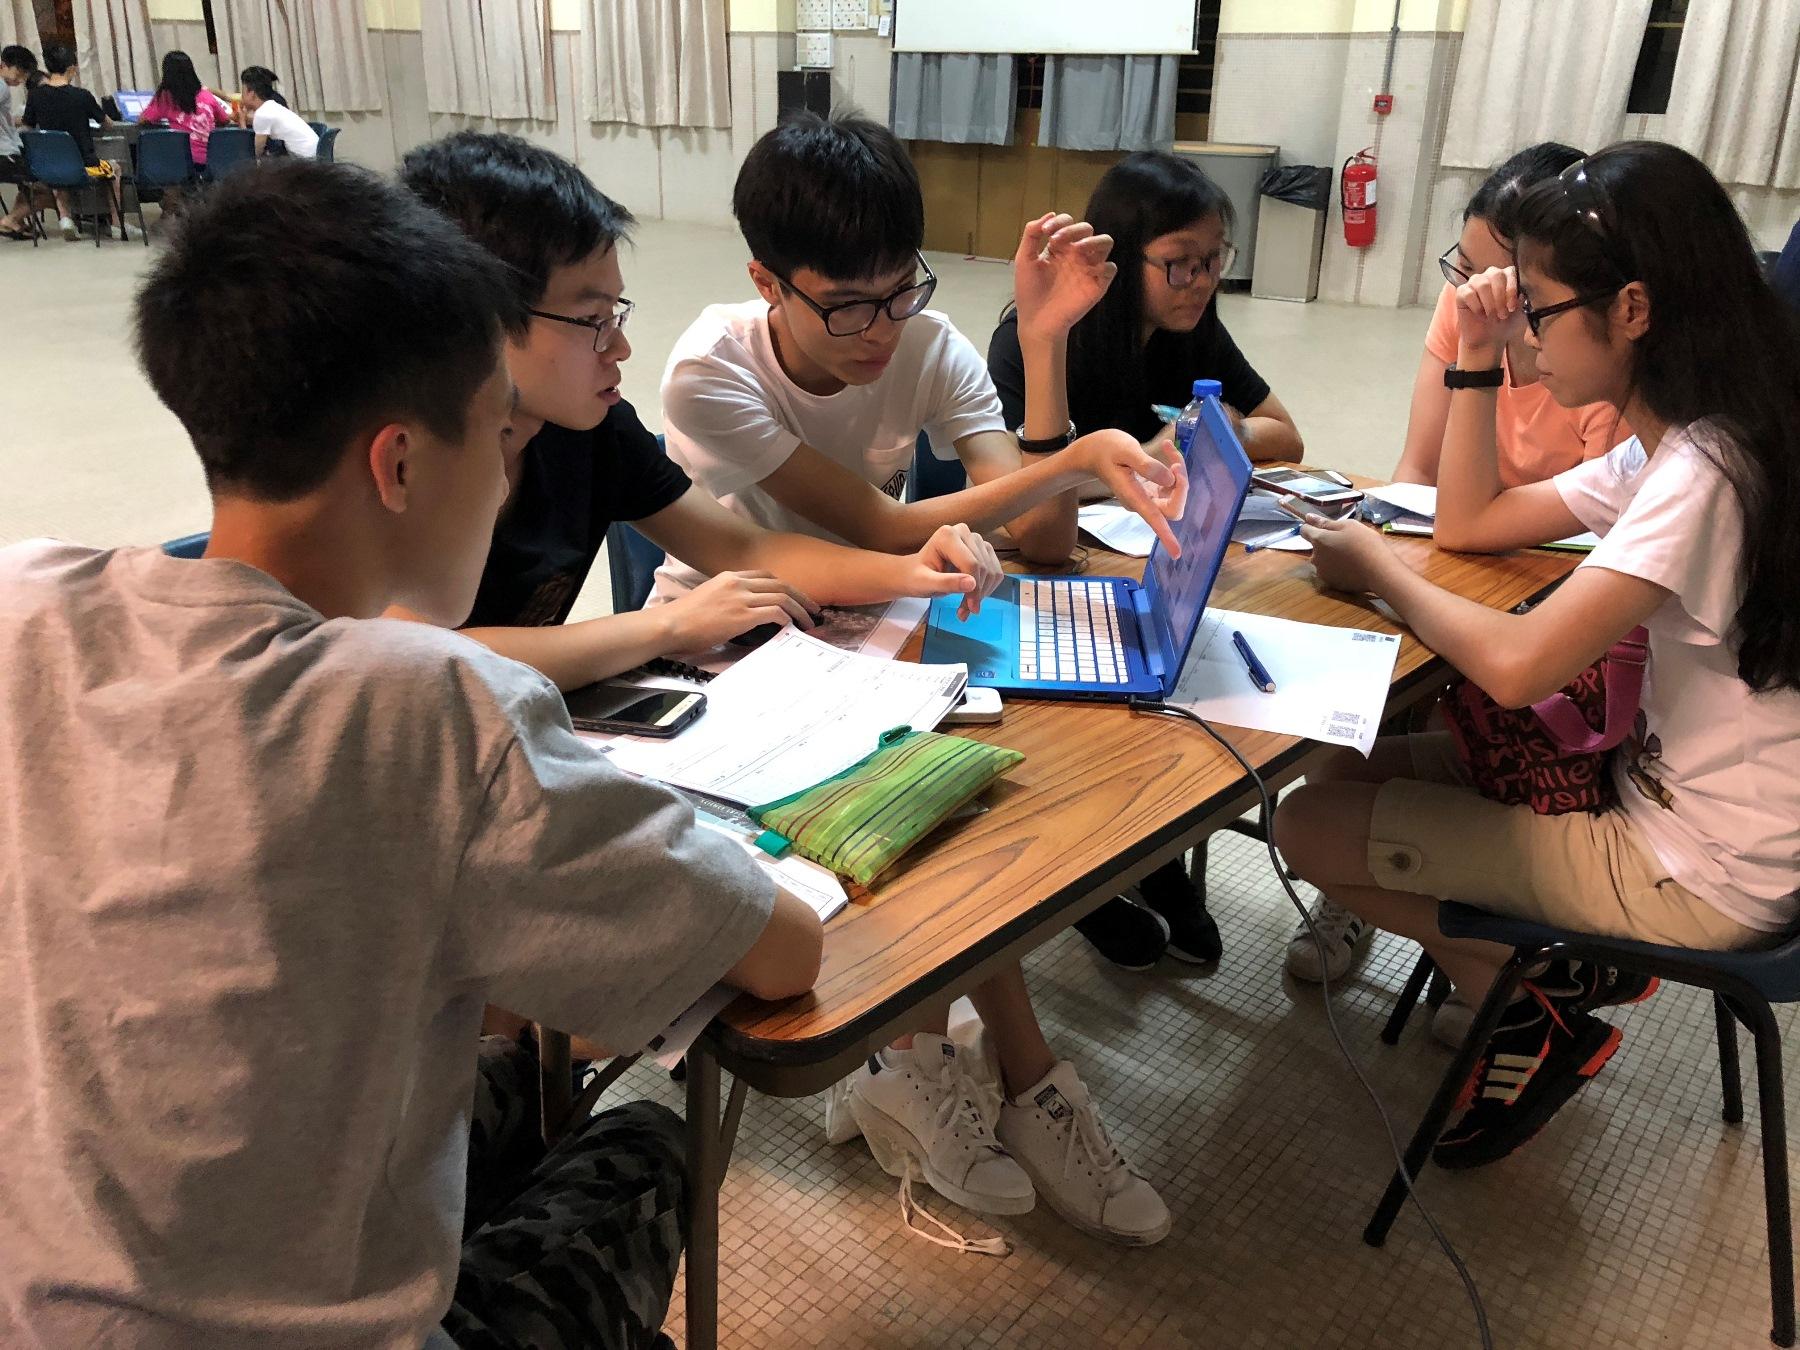 http://npc.edu.hk/sites/default/files/19_68.jpg